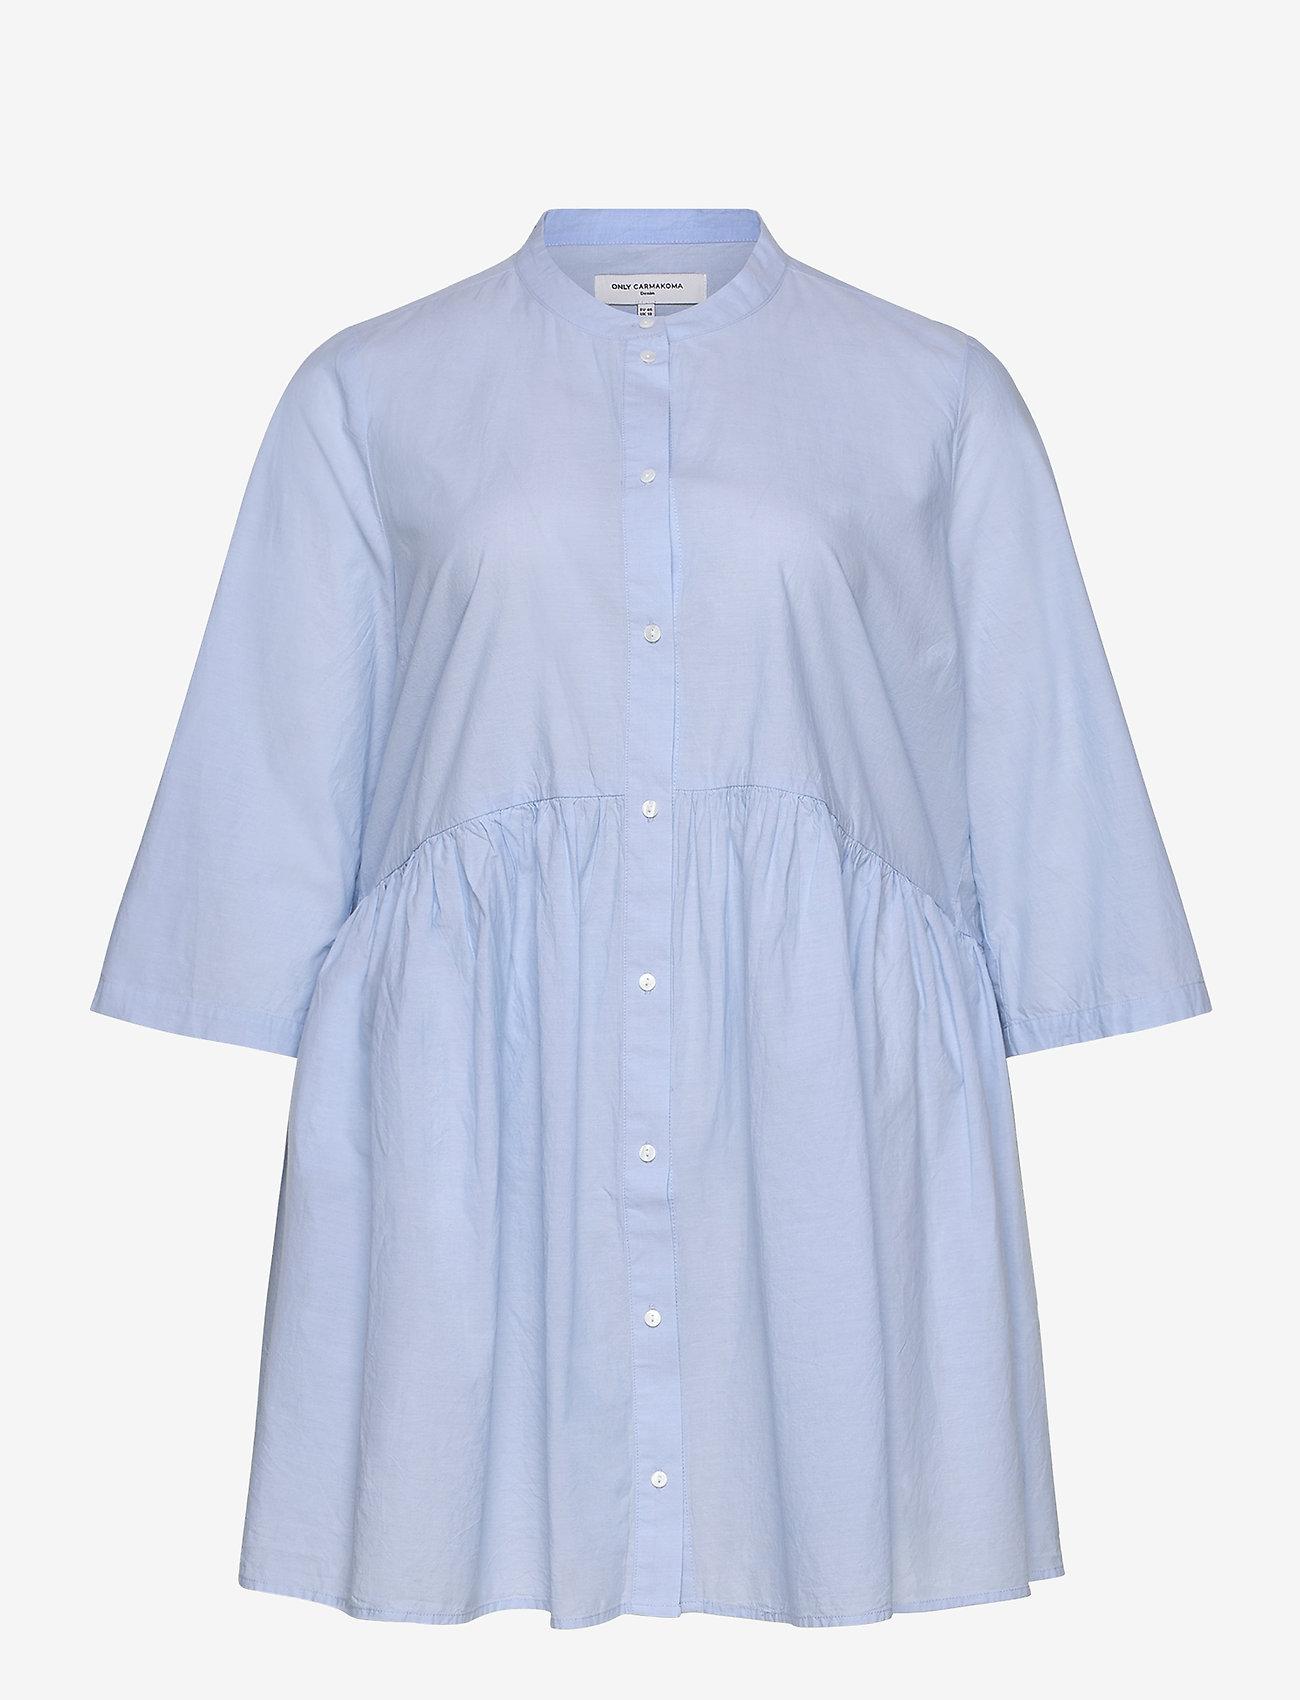 ONLY Carmakoma - CARCHICAGO LIFE 2/4 DNM TUNIC DRESS - long sleeved blouses - light blue denim